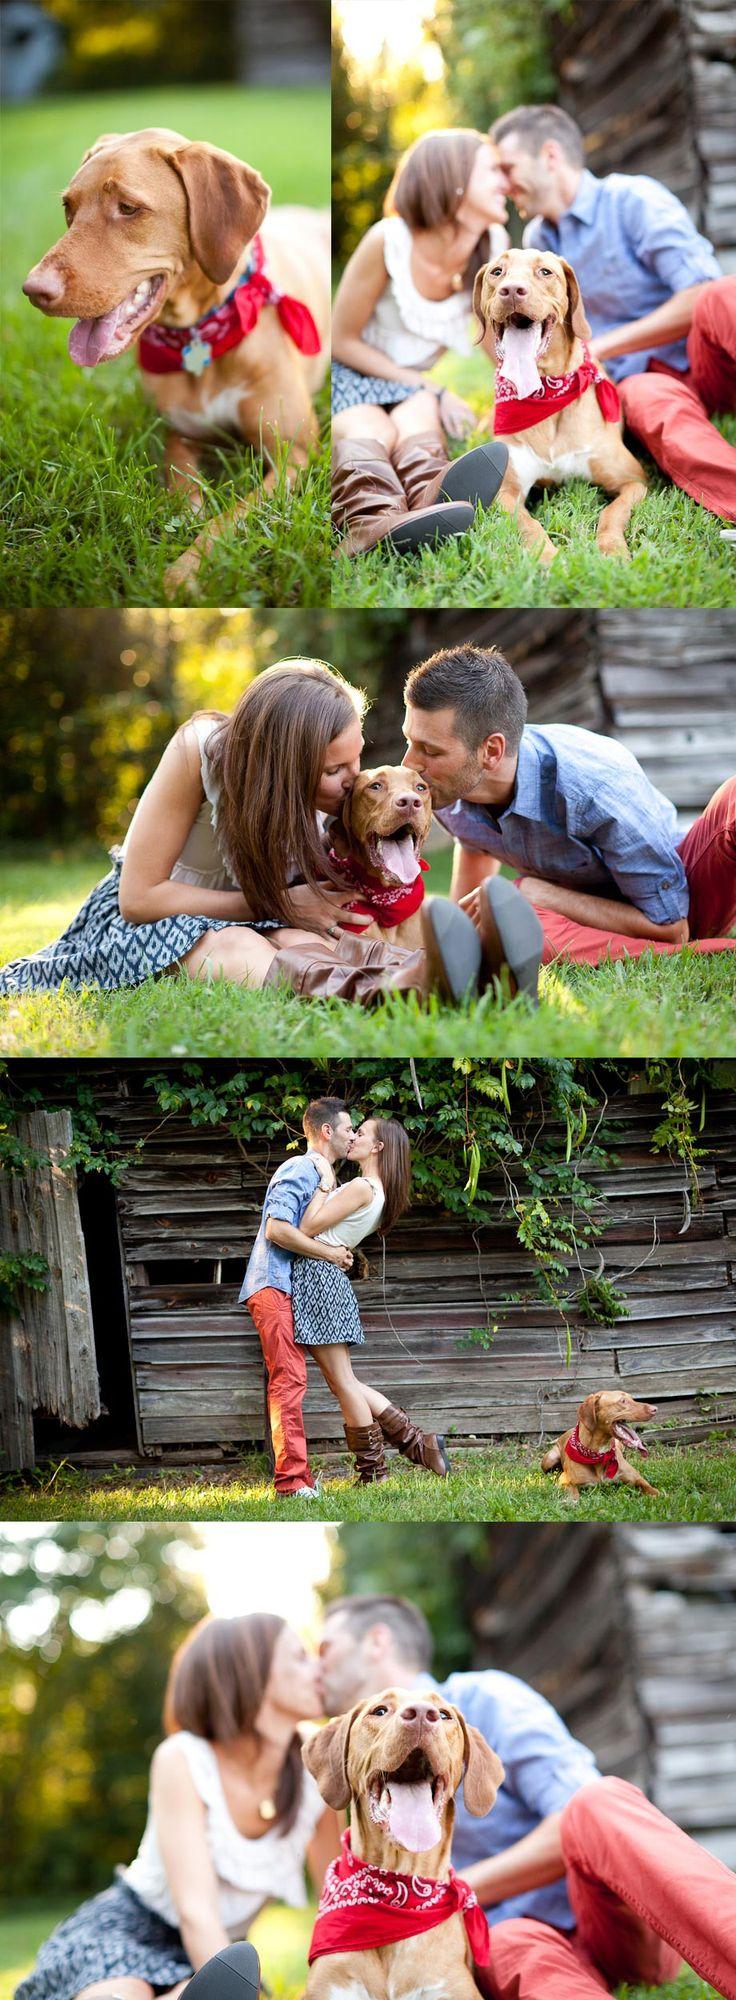 Cute engagement pic ideas!